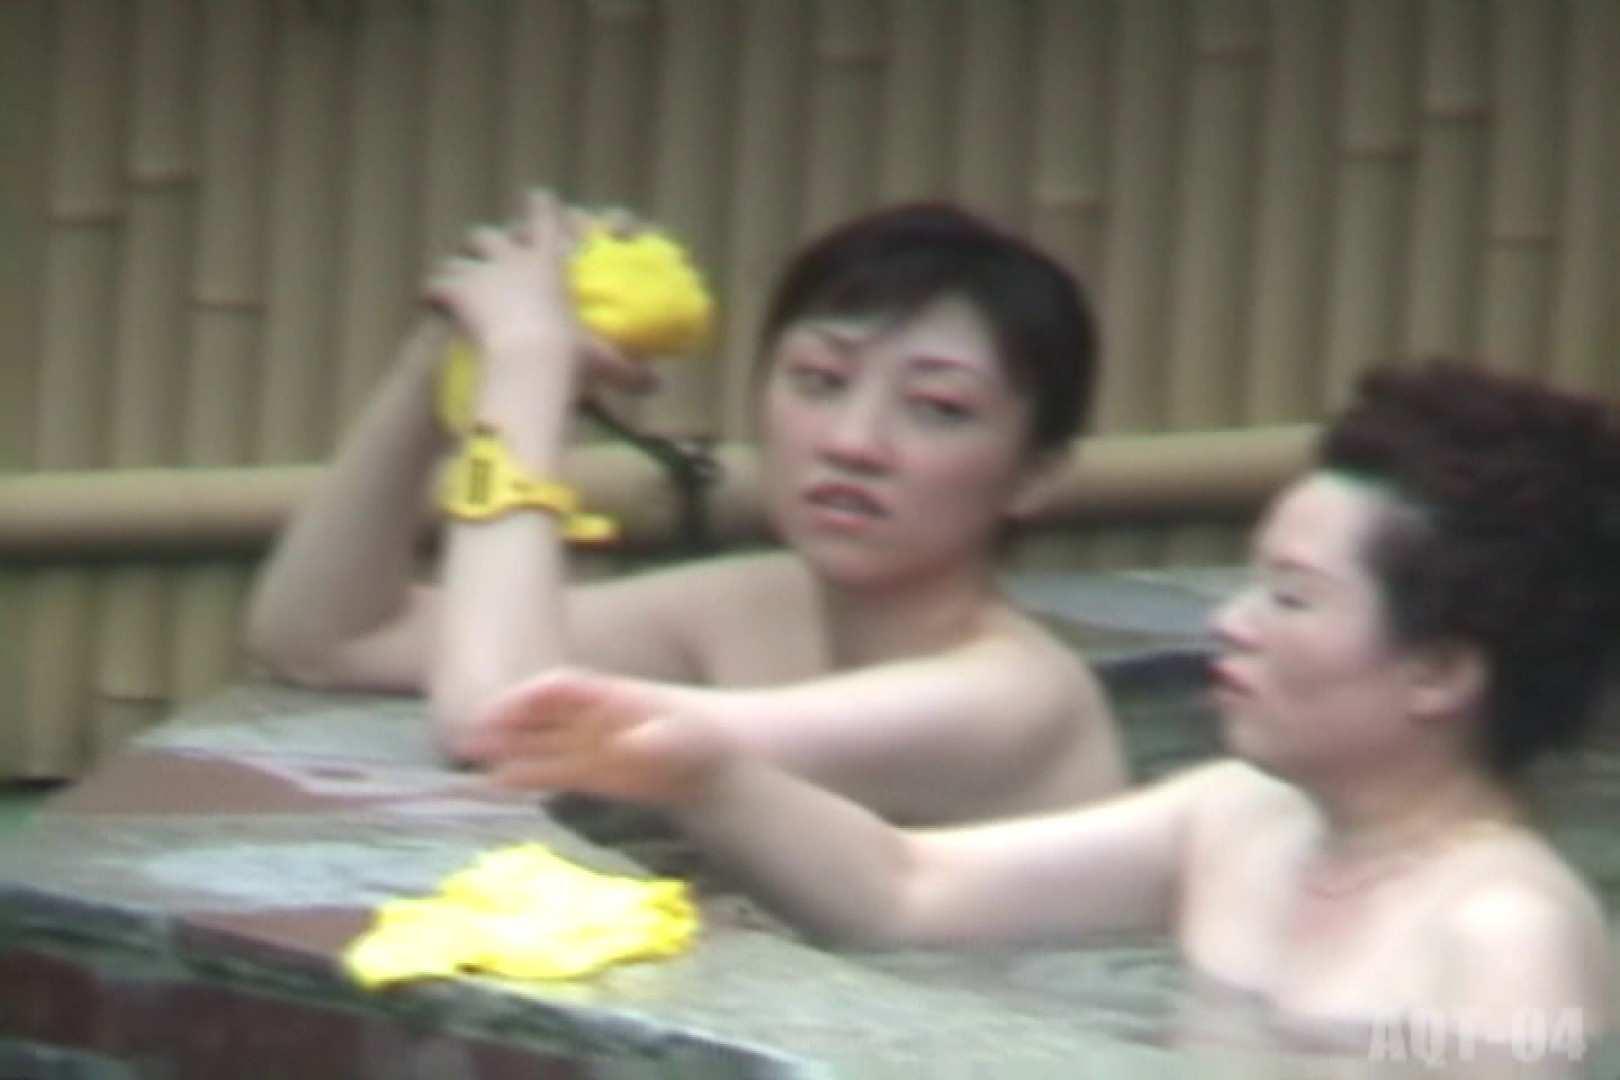 Aquaな露天風呂Vol.743 OLセックス  108画像 18